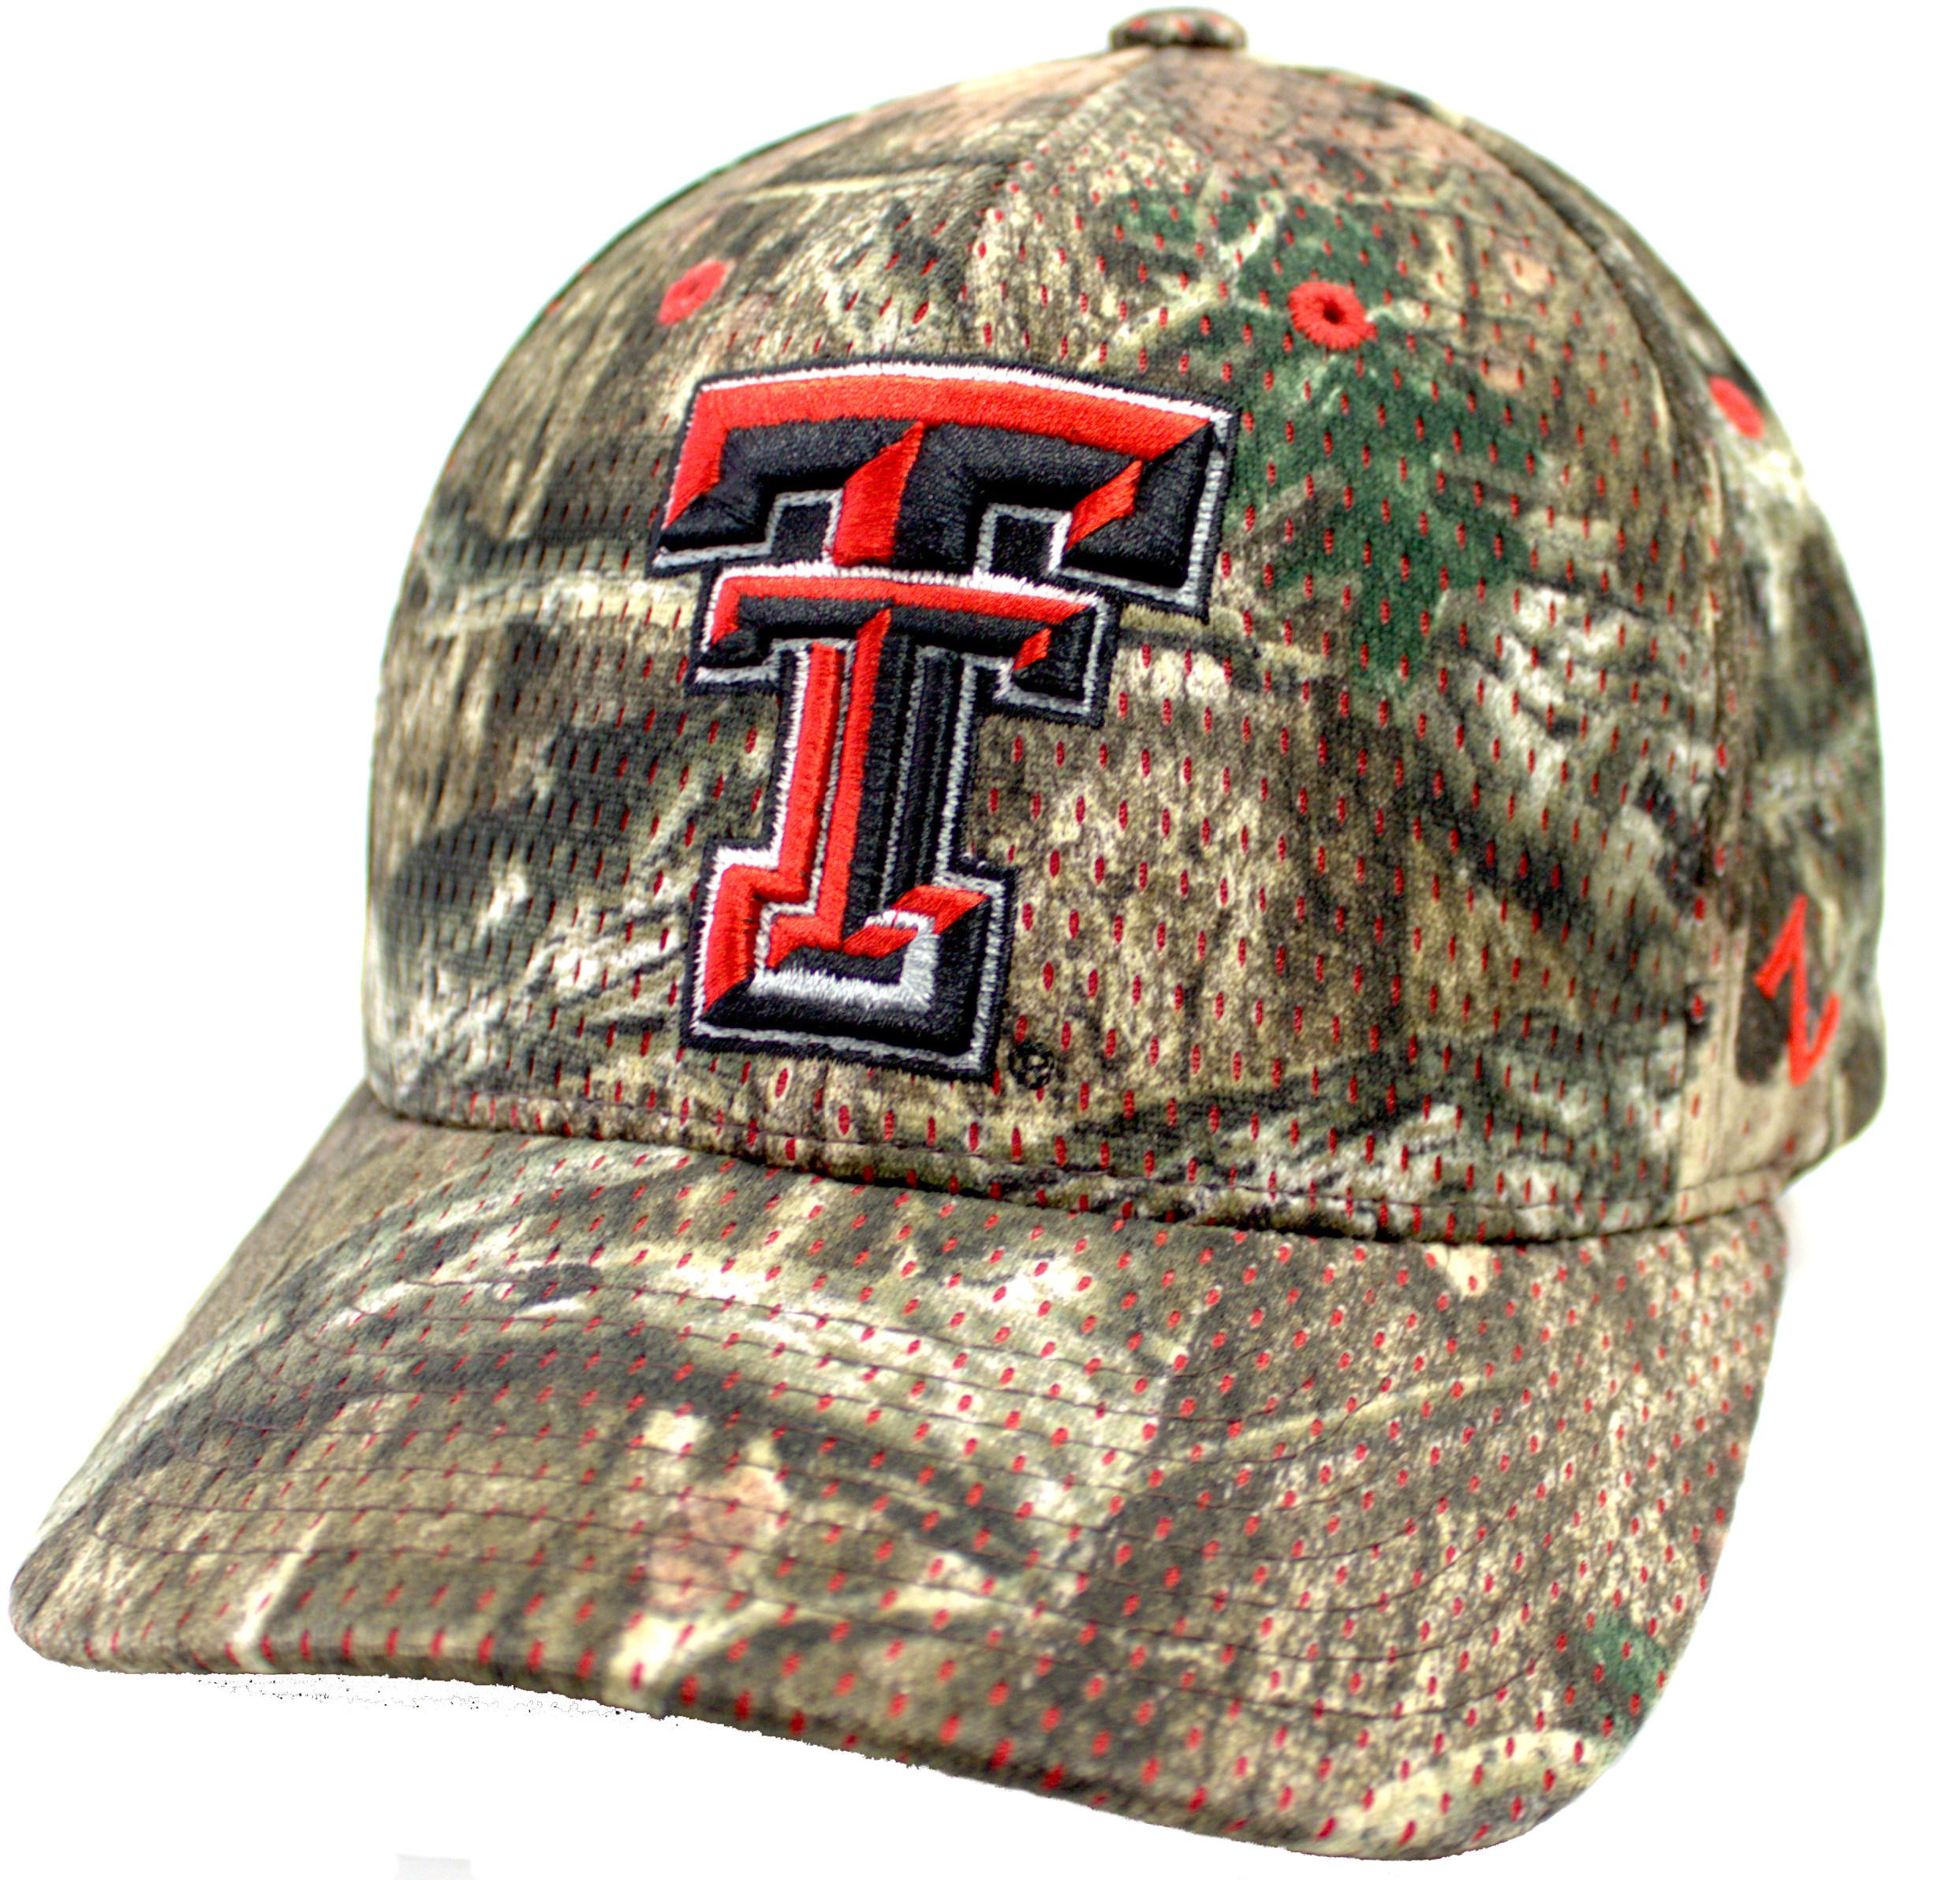 62e78b53db7 ... cheapest texas tech red raiders mossy oak camouflage adjustable hat  be58c b12b3